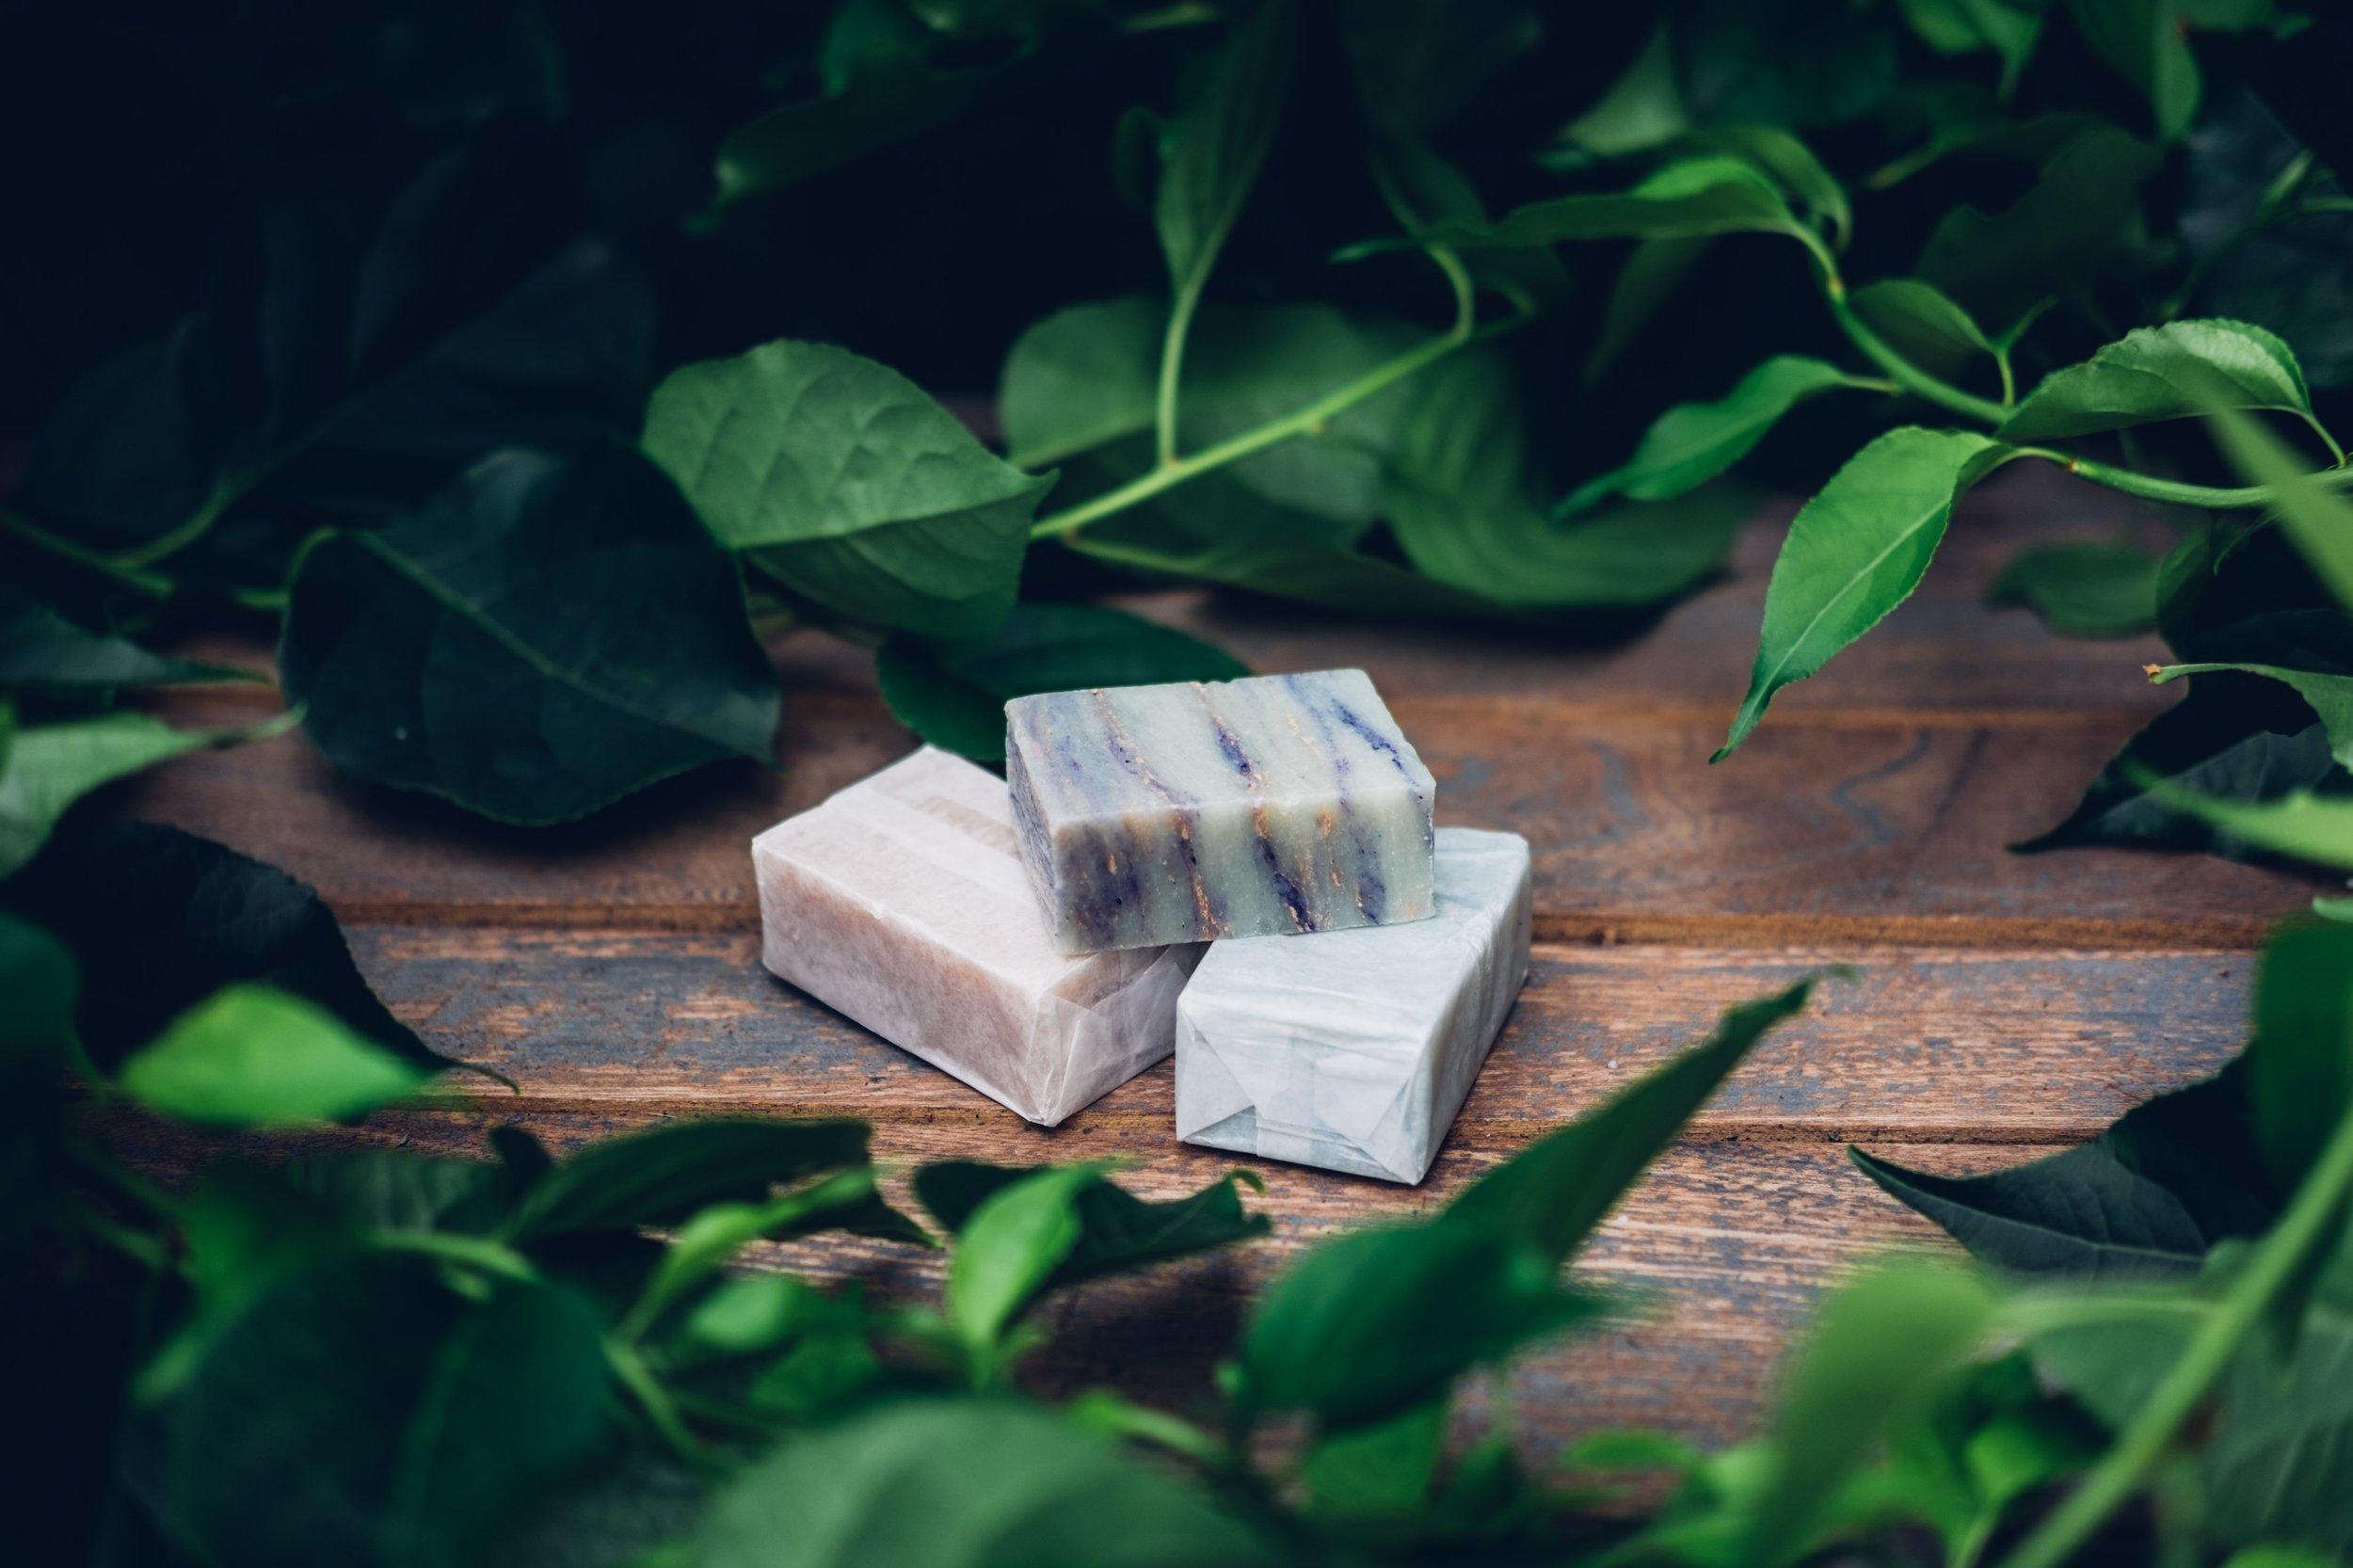 handmade-soap-stacked_4460x4460 Photo by Christian Mackie from Burst.jpg